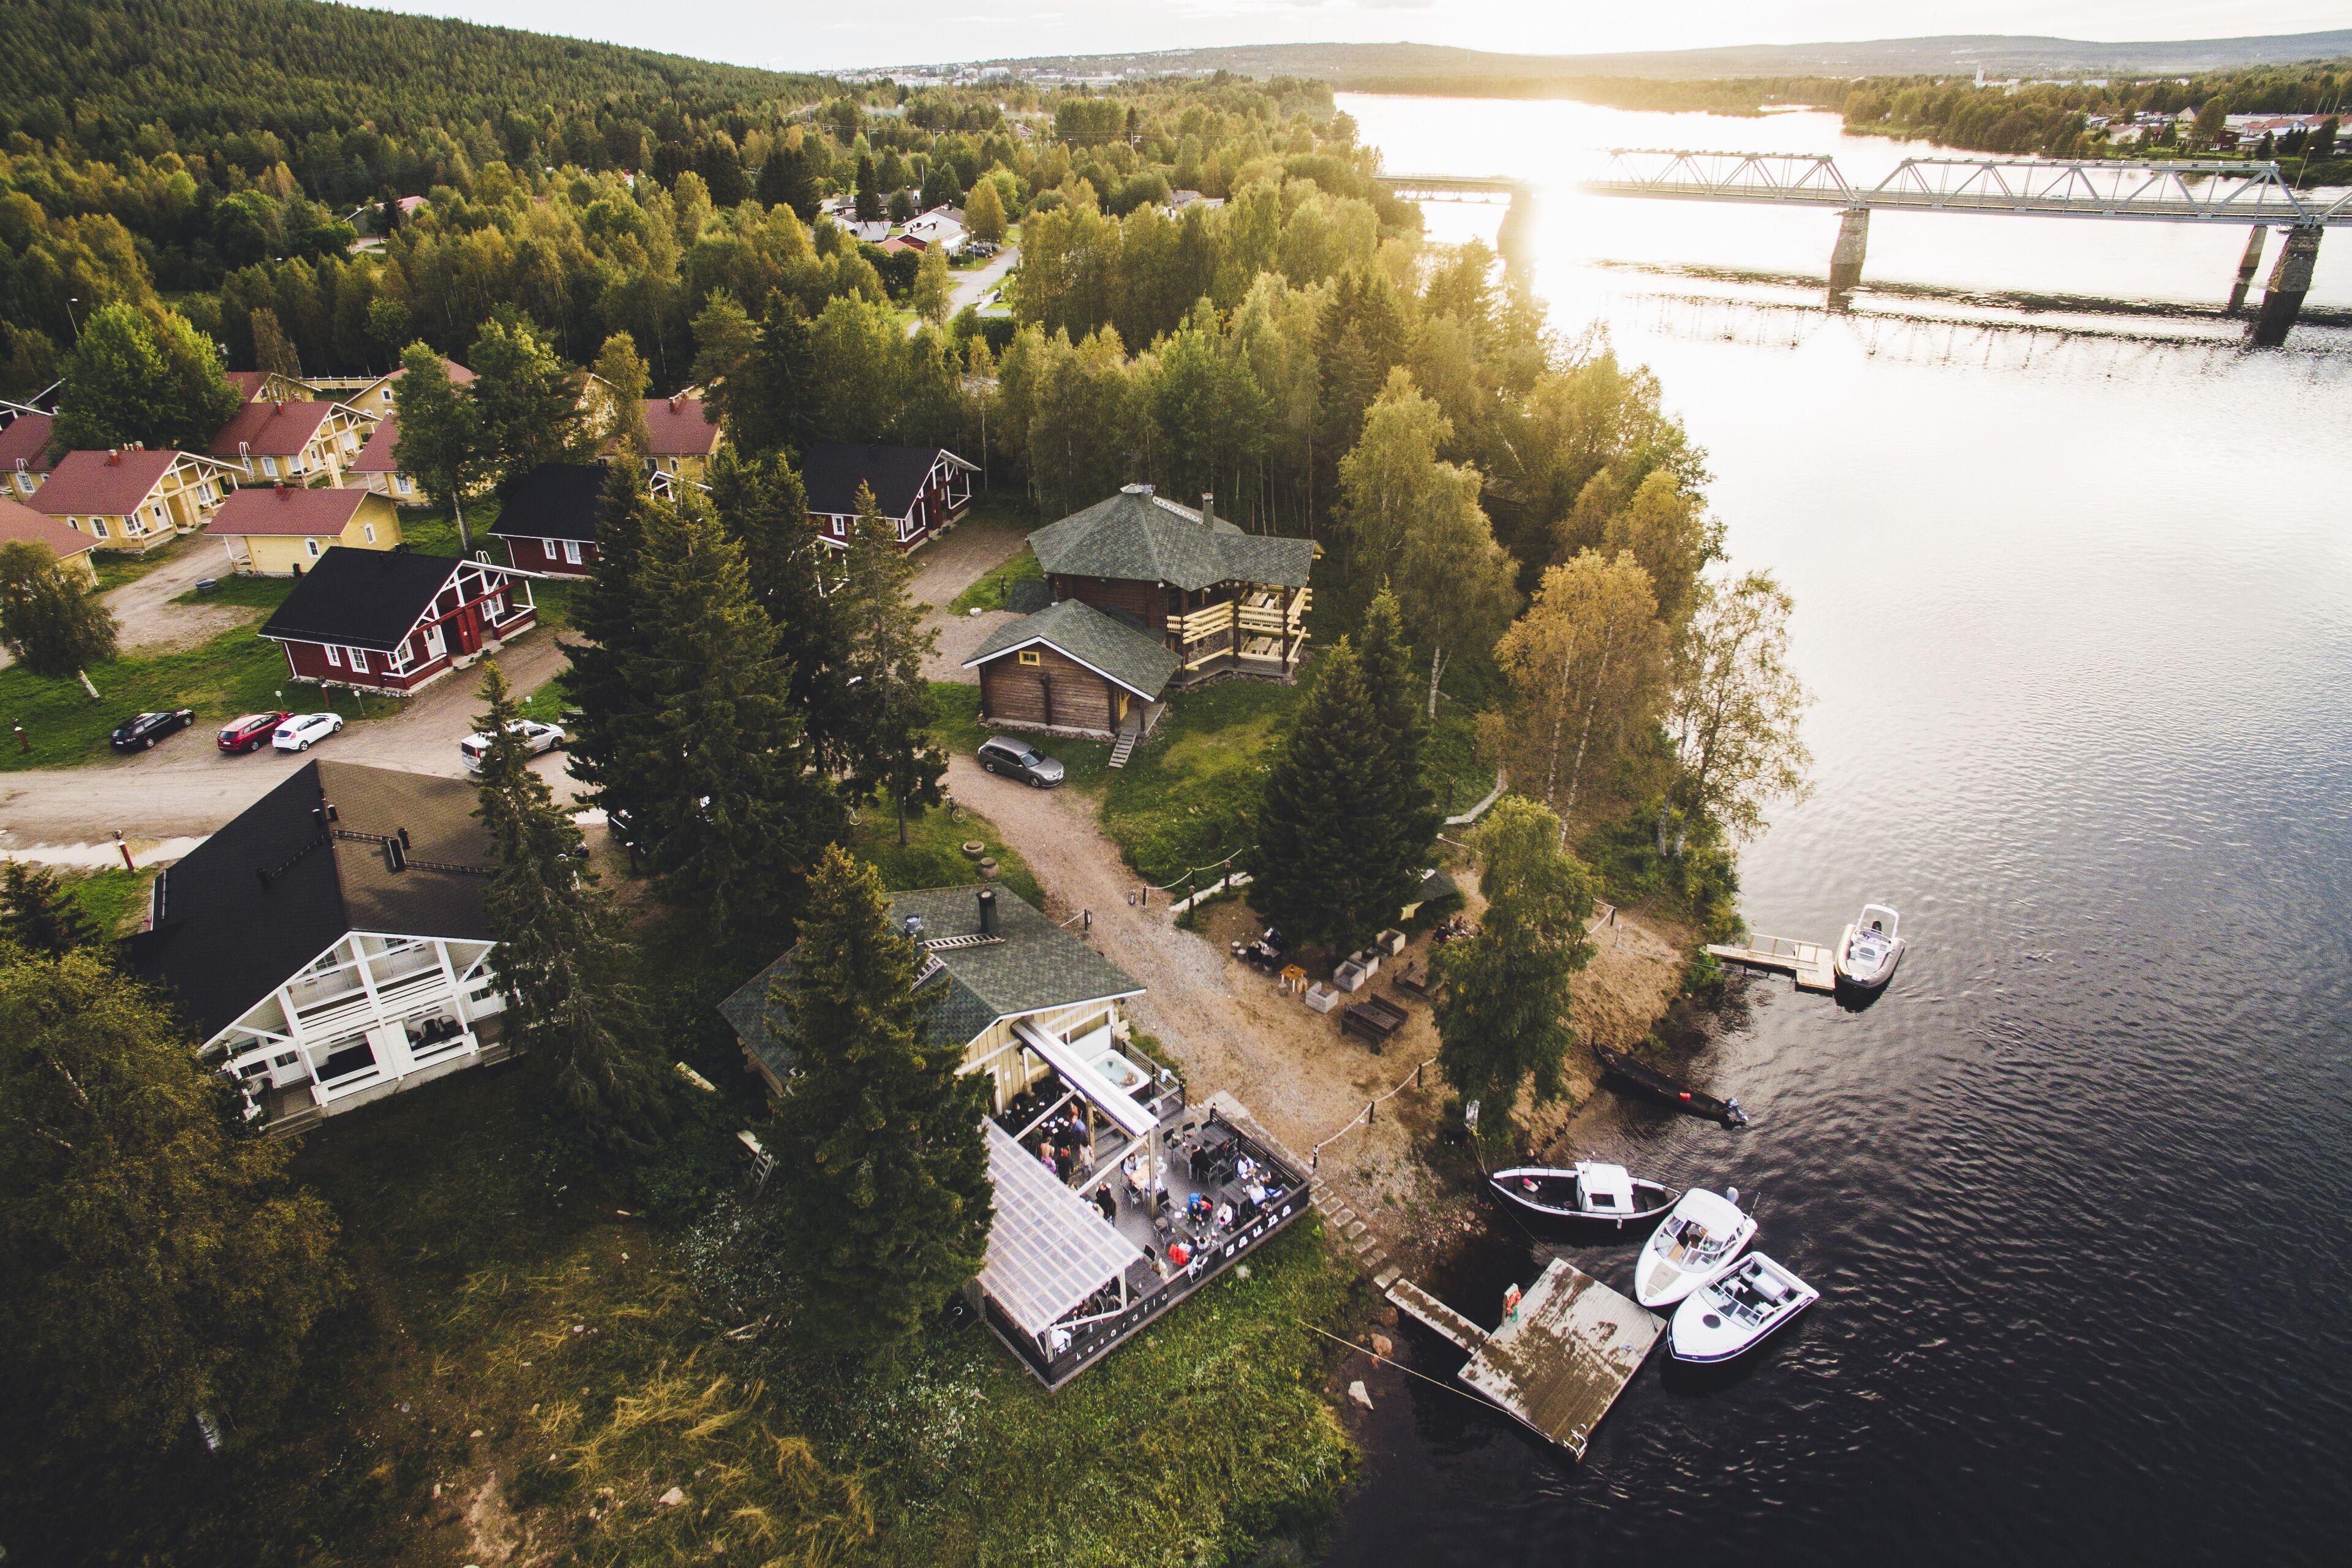 Lapland Hotel Ounasvaara Chalets